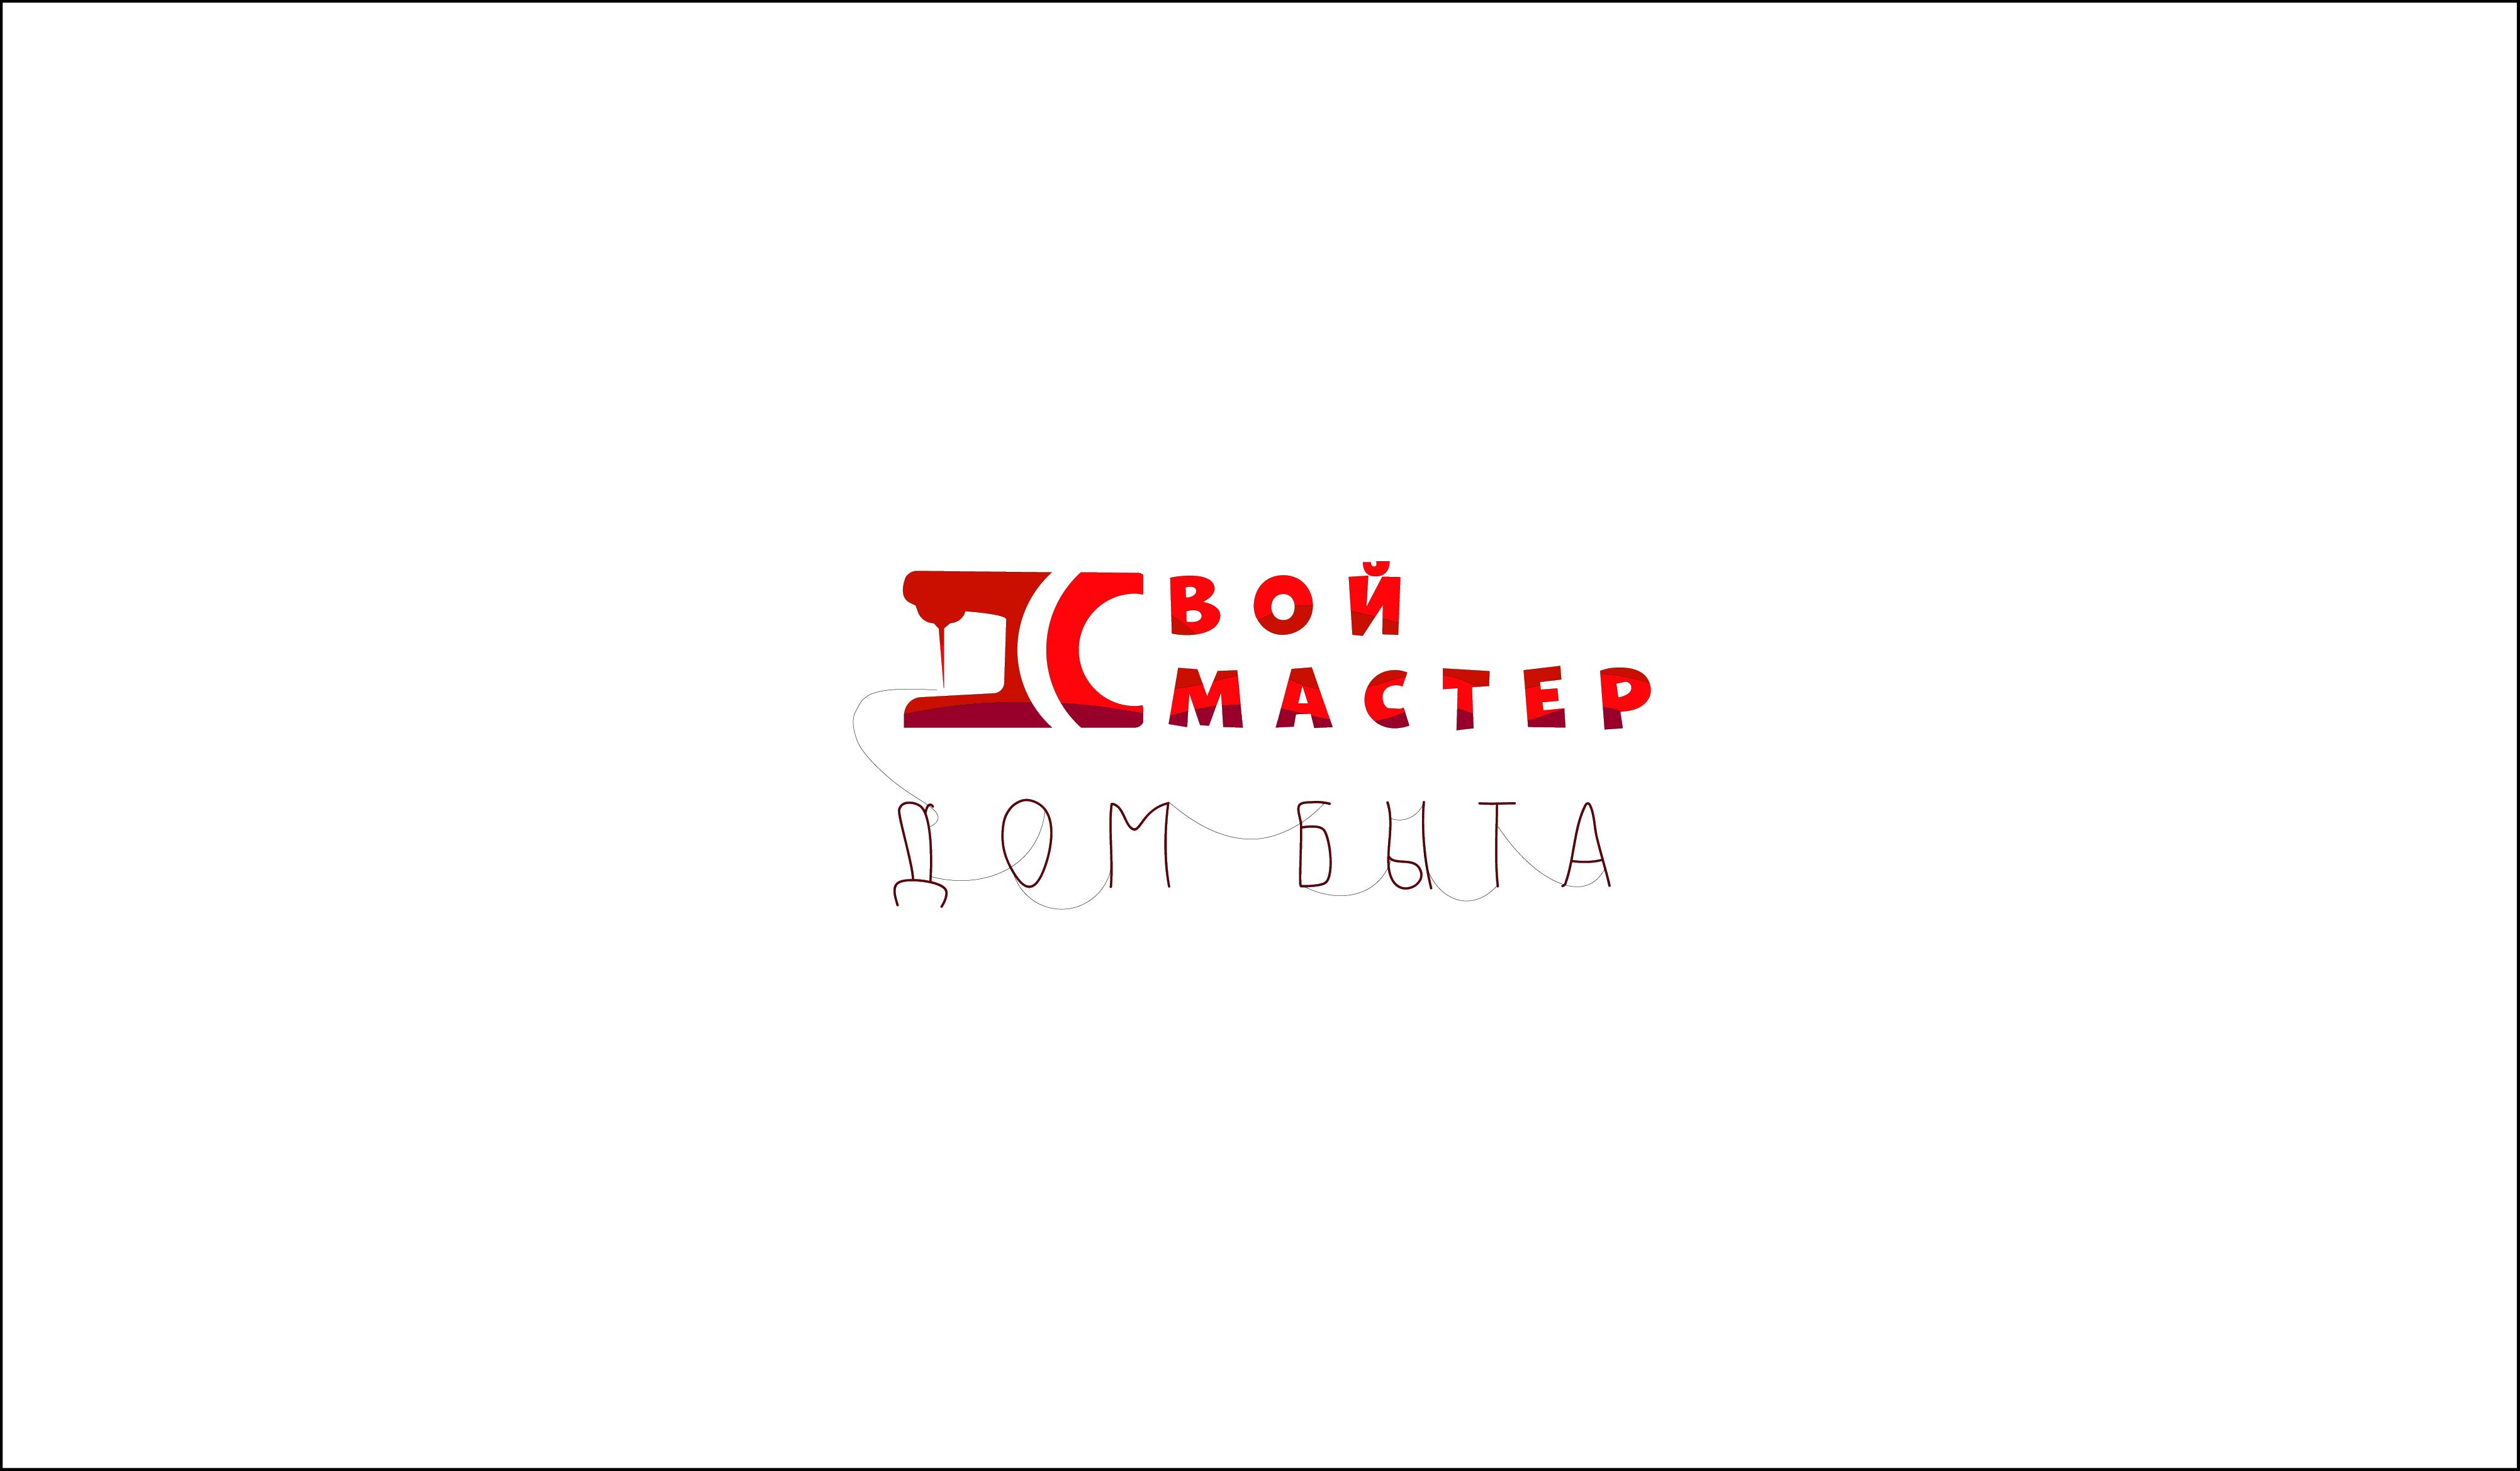 Логотип для сетевого ДОМ БЫТА фото f_4435d73b9aeea864.png